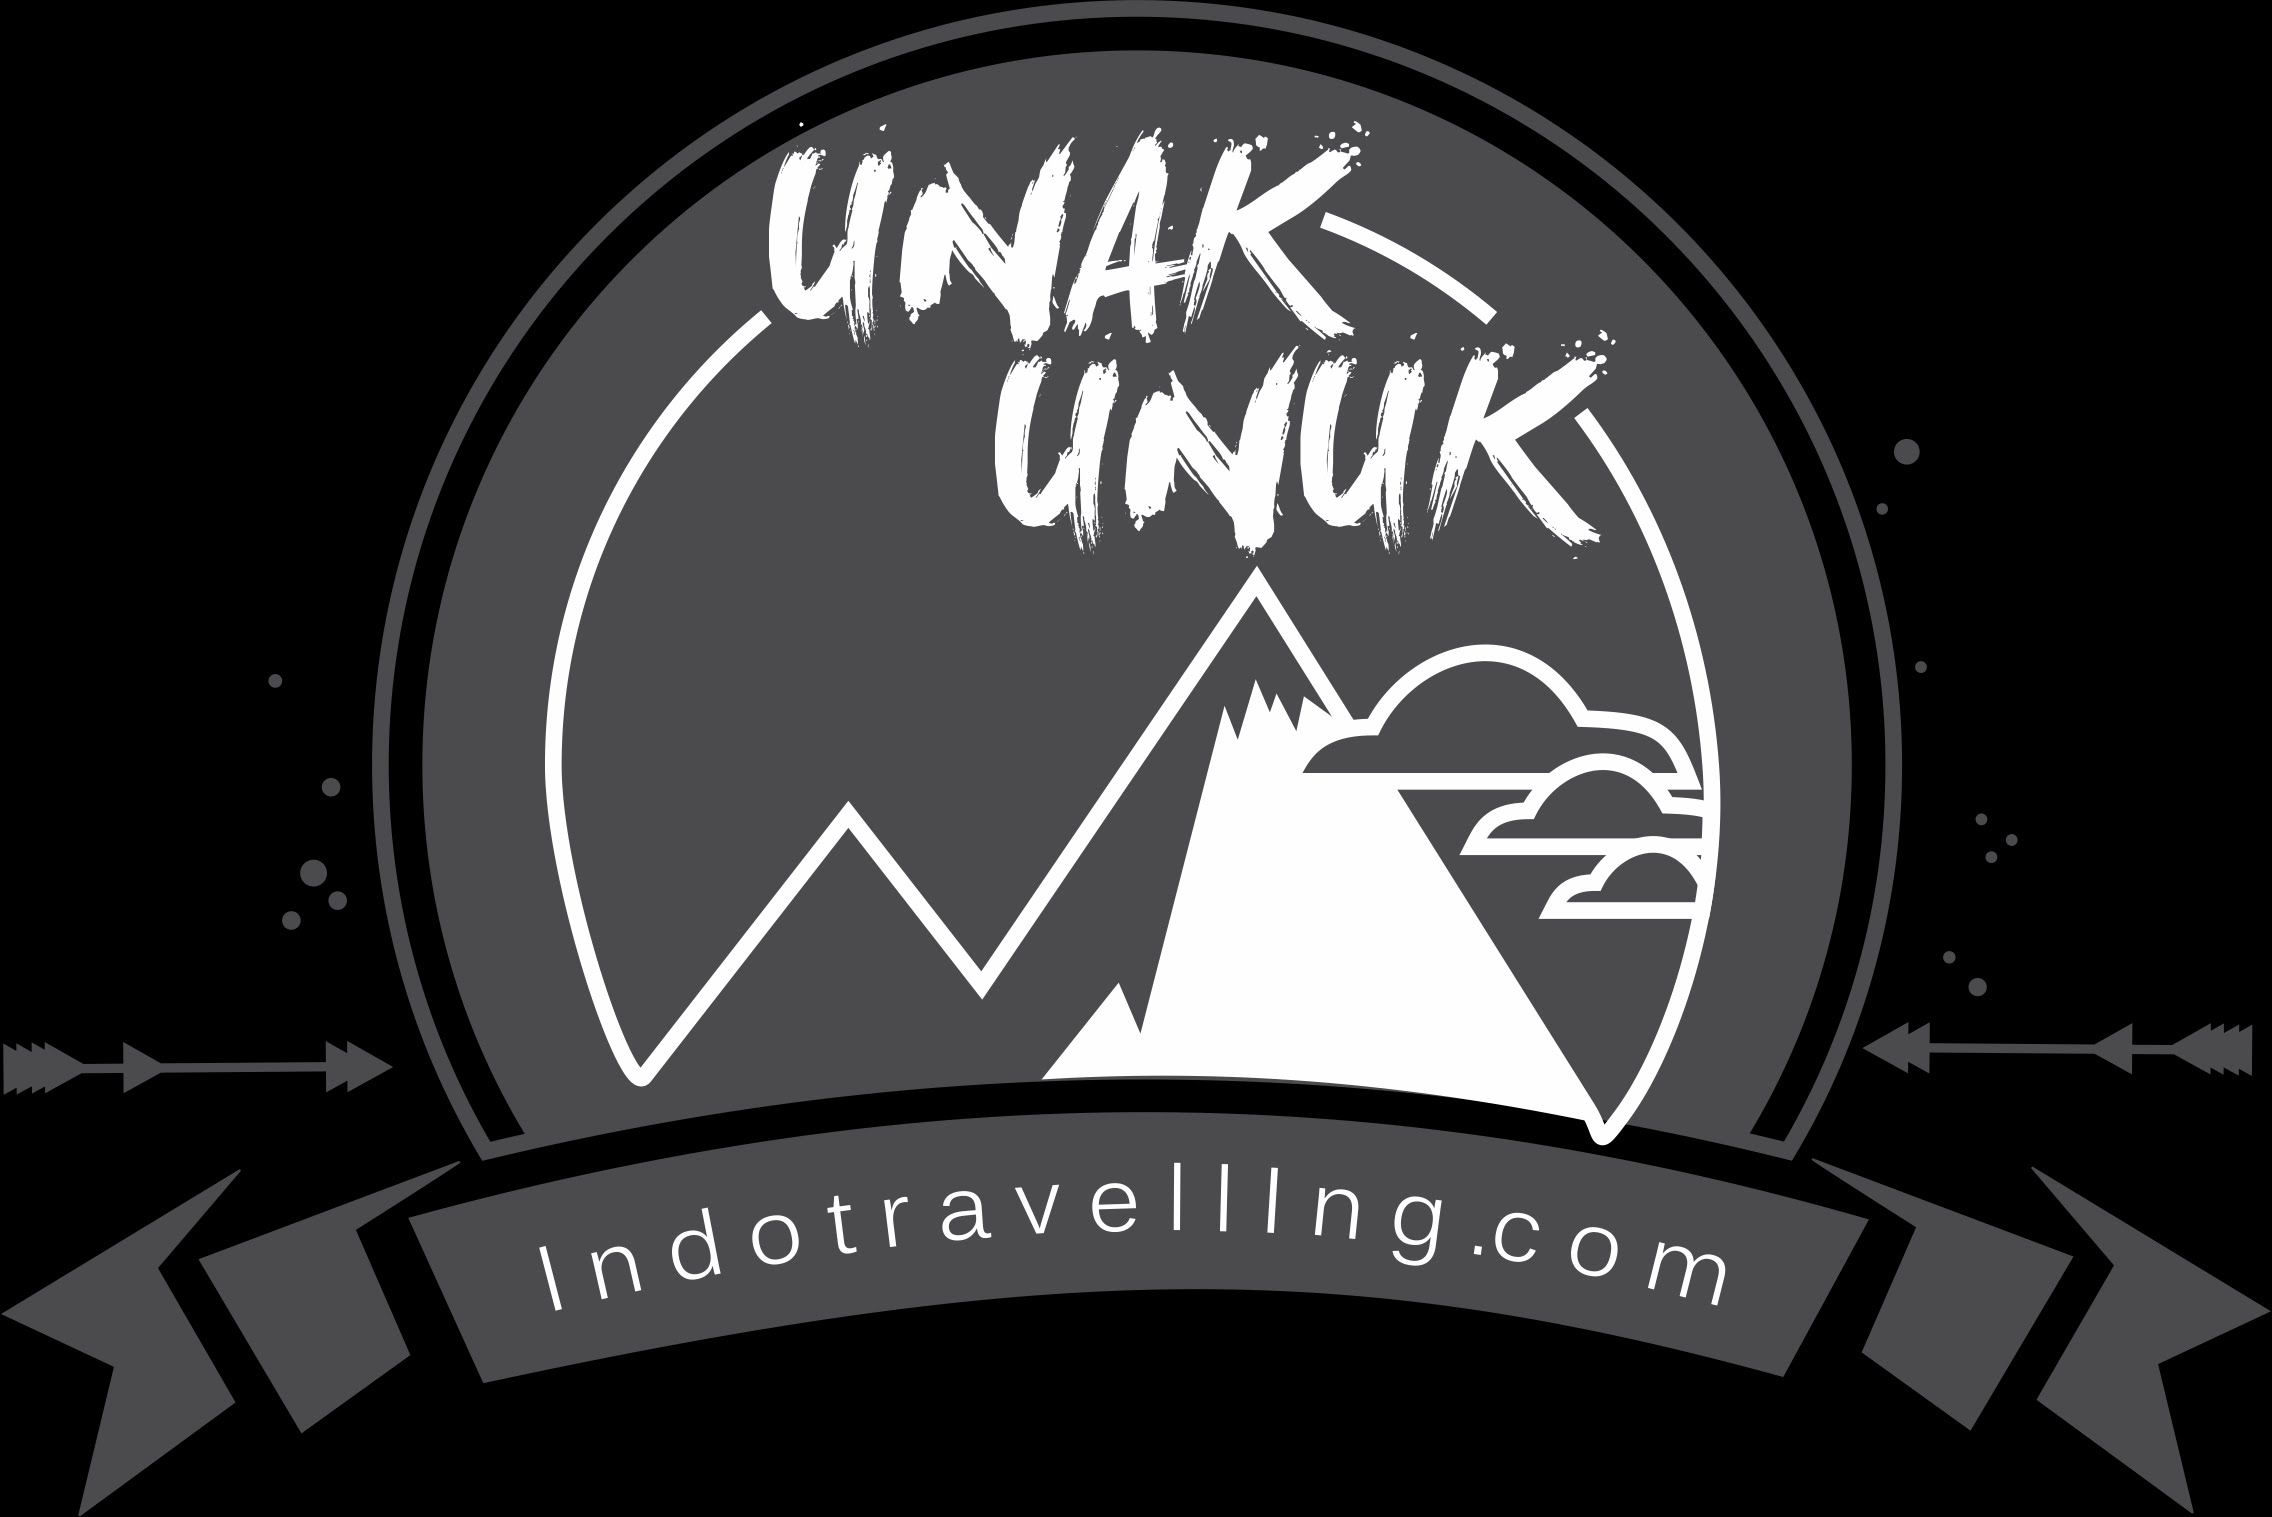 Poster design in coreldraw x7 - Tutorial Coreldraw X7 For Beginners Simple Travelling Logo Design